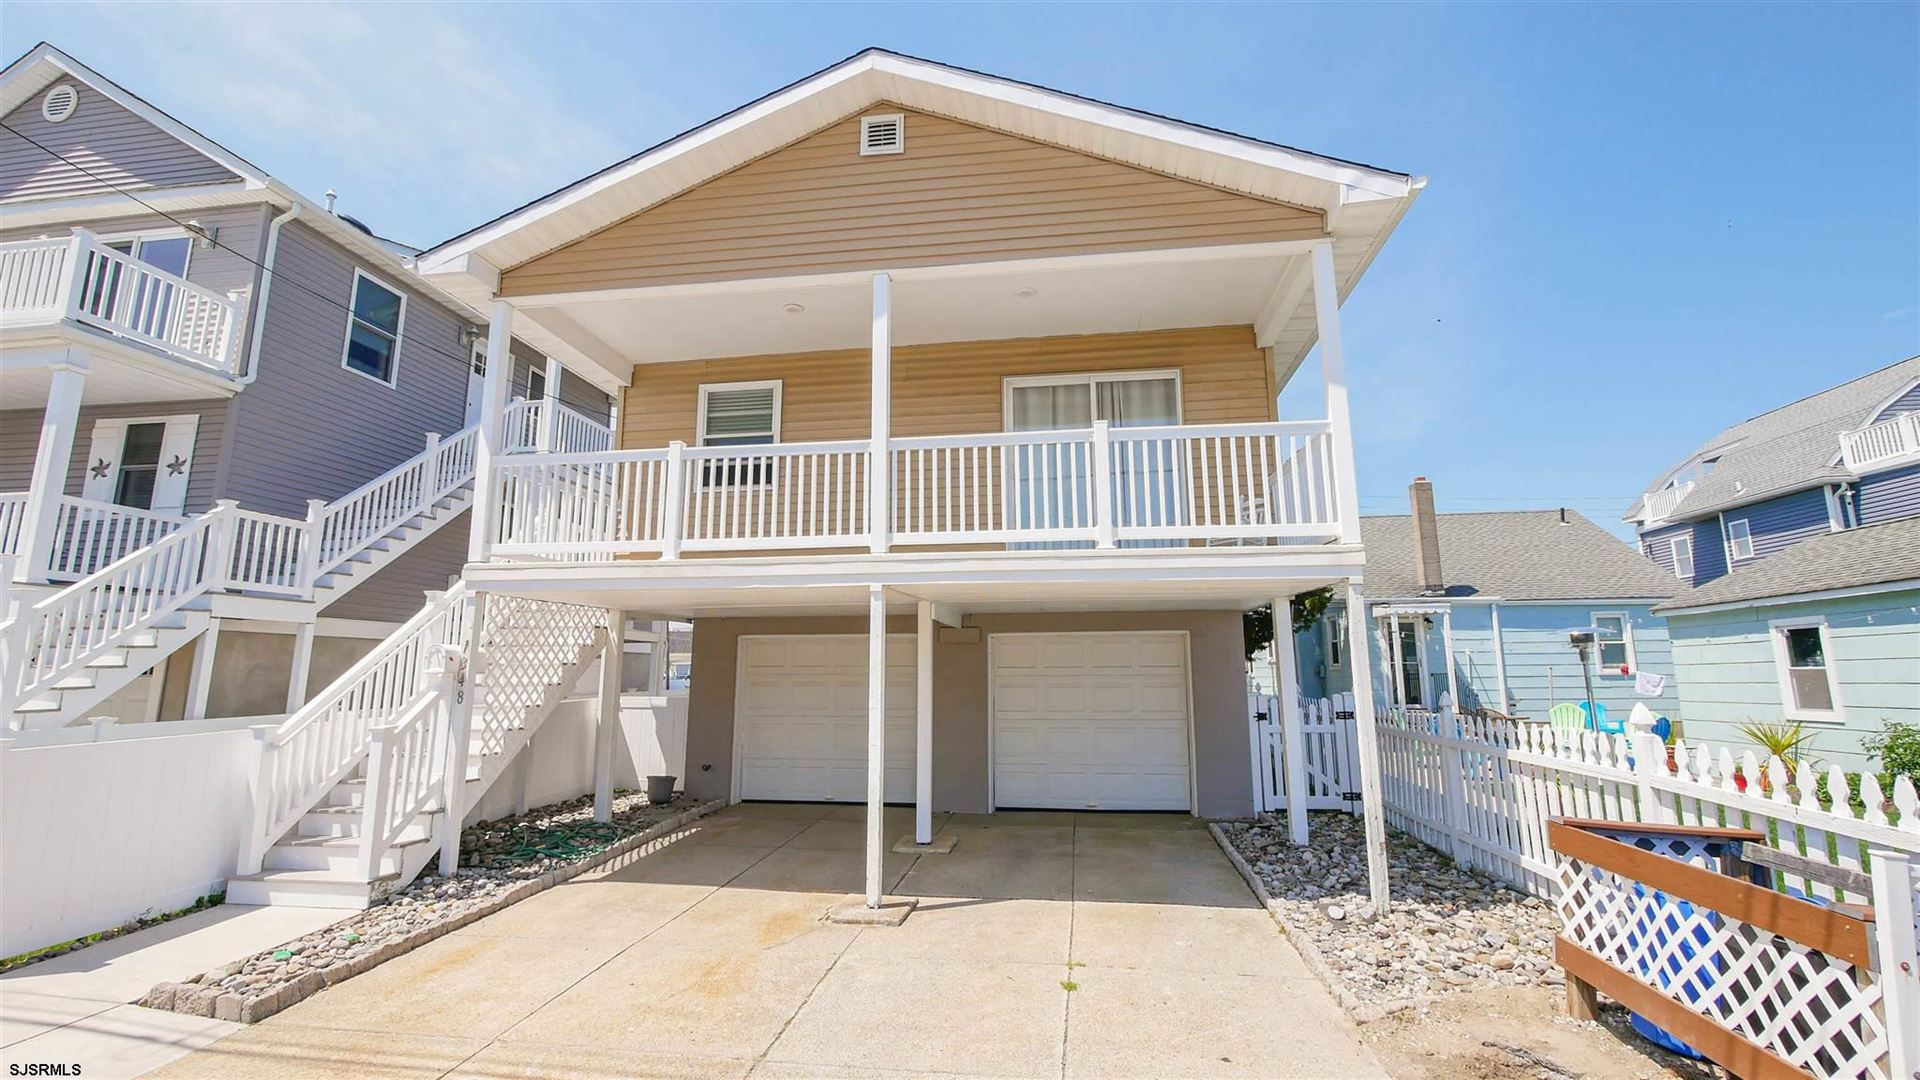 1348 Tioga Terrace, Ocean City, NJ 08226 - #: 551924